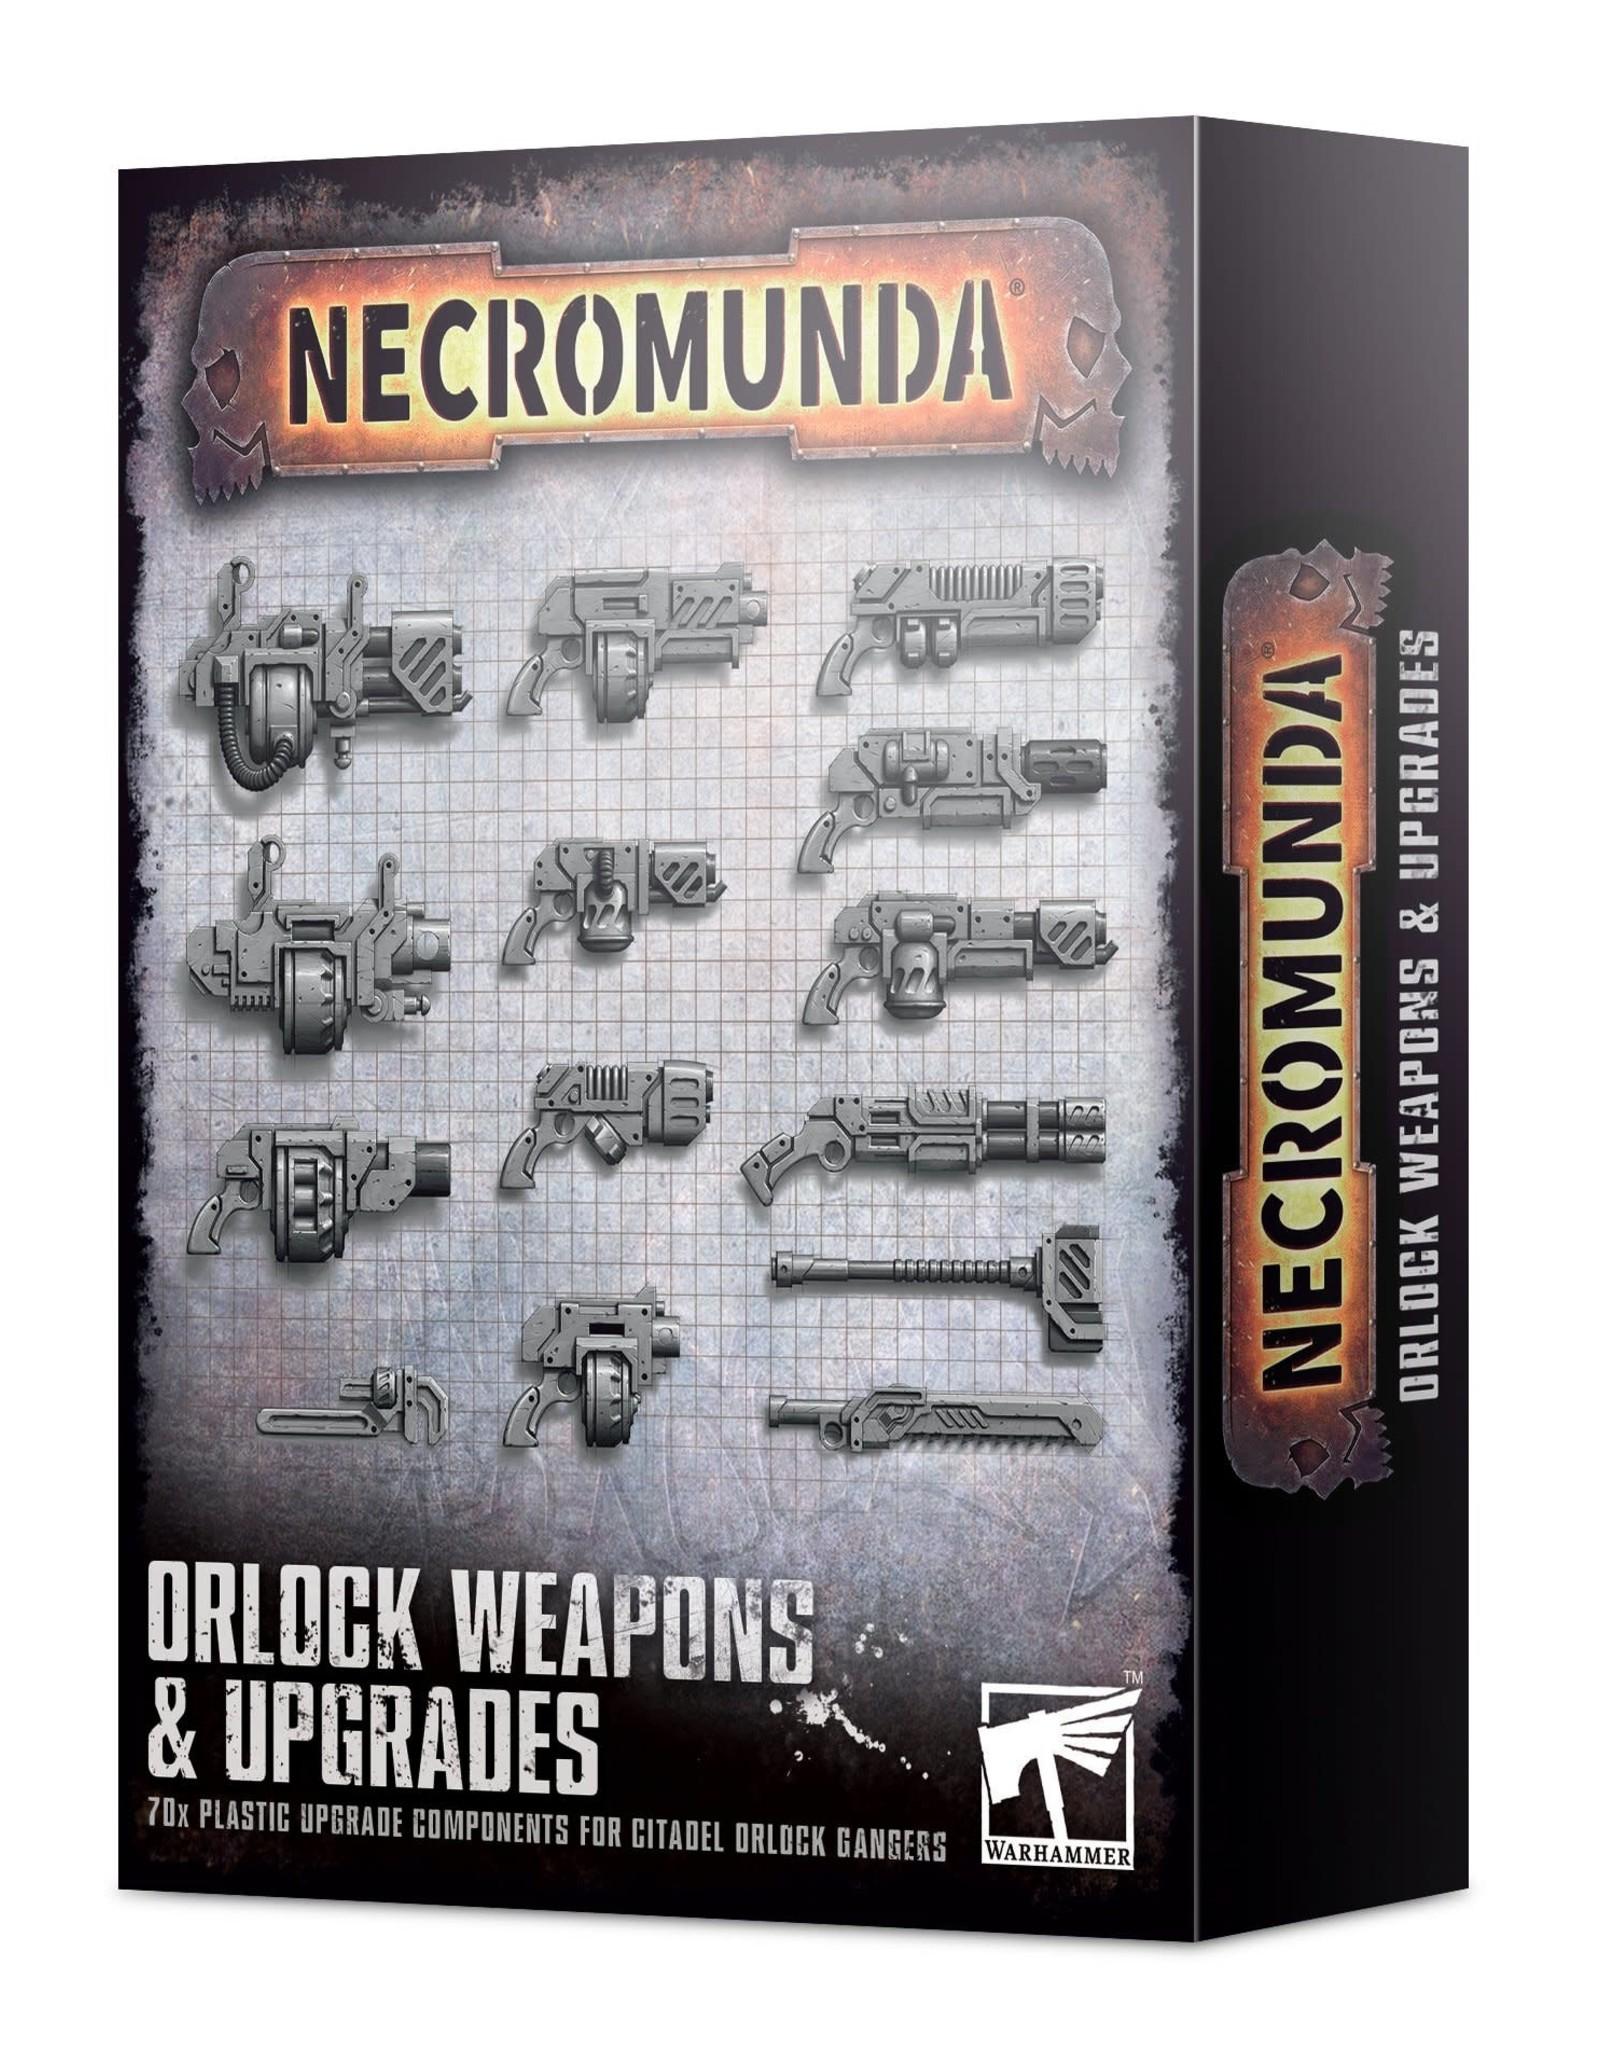 Games Workshop Necromunda: Orlock Gang Weapons and Upgrades